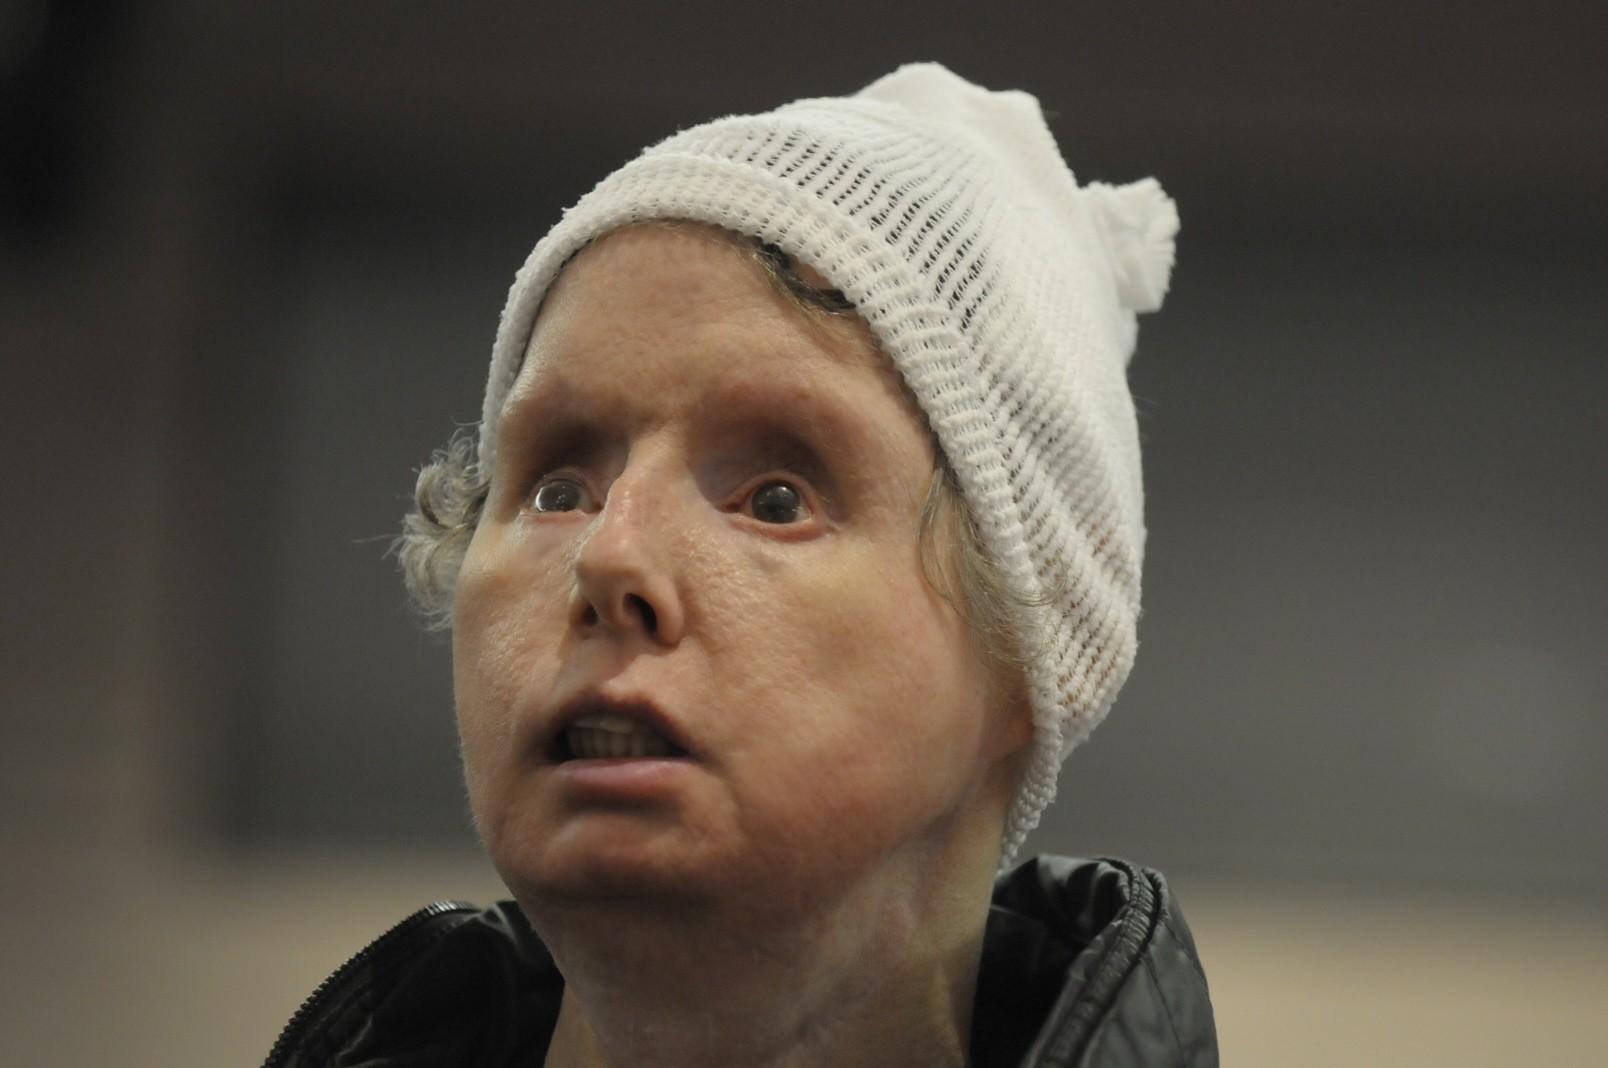 Chimp Attack Victim Charla Nash Criticizes State: 'Why